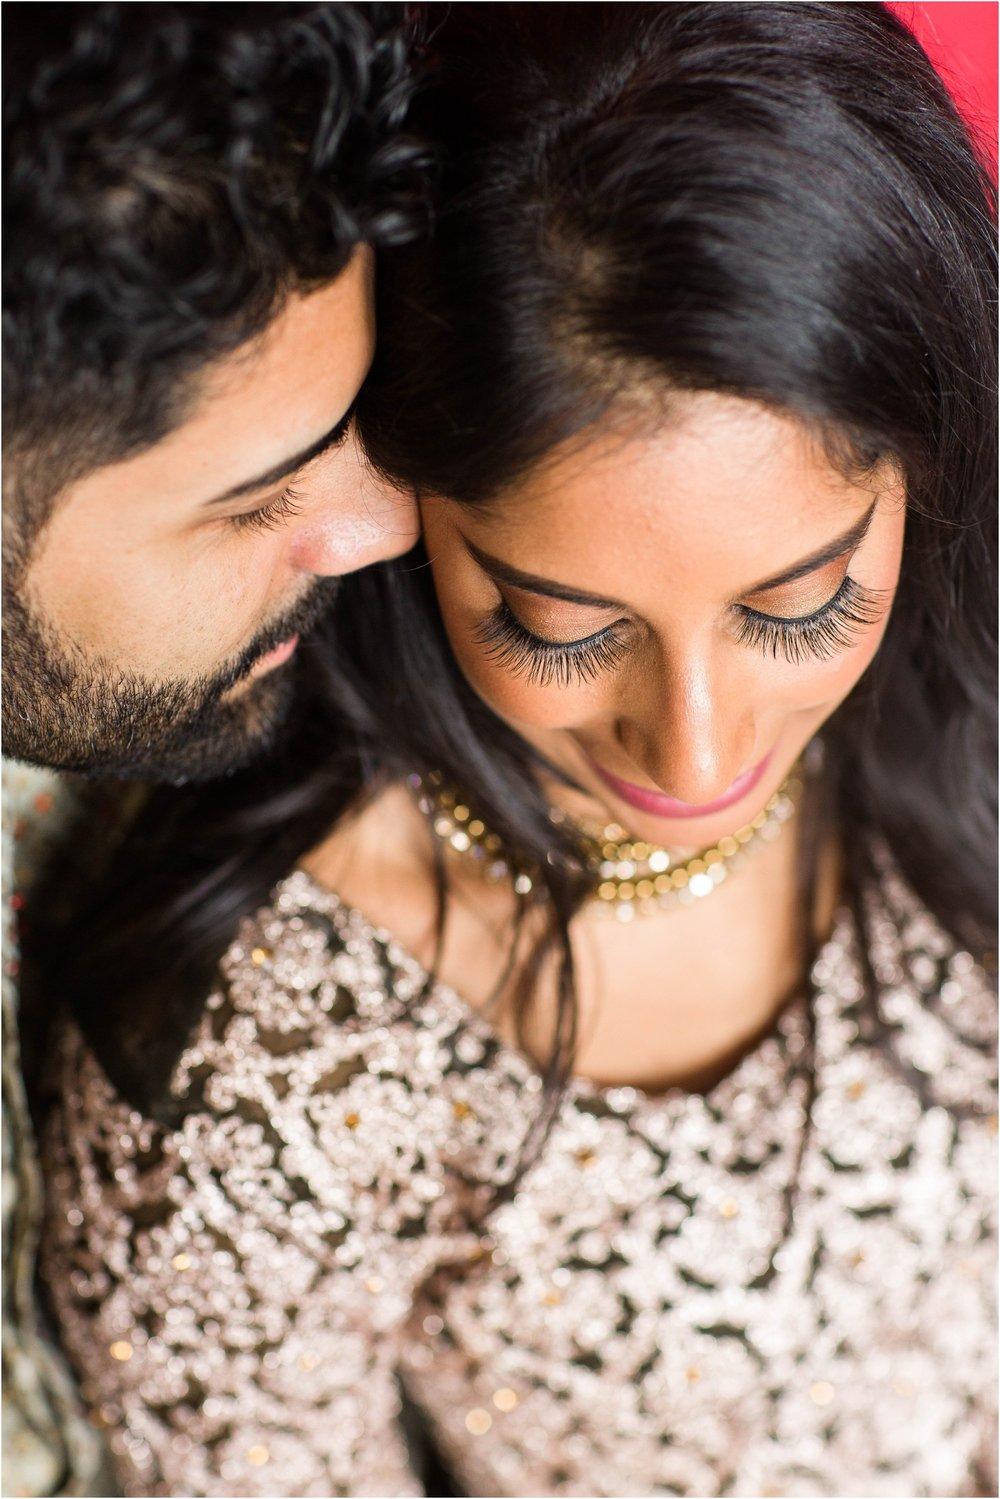 Mint-Room-Studios-Anniversary-Session-Toronto-Mississauga-Brampton-Scarborough-GTA-Pakistani-Indian-Wedding-Engagement-Photographer-Photography_0037.jpg